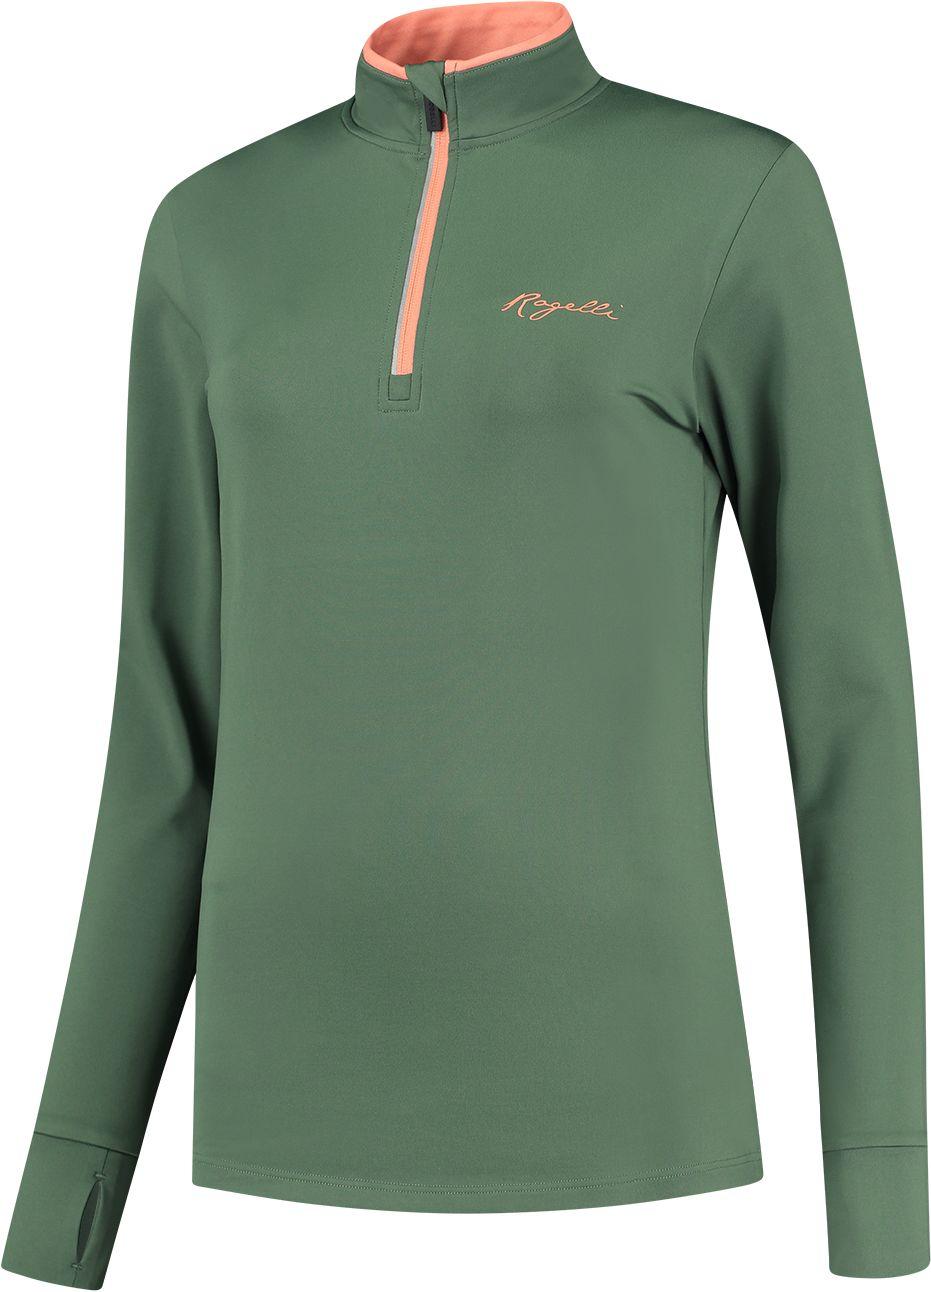 ROGELLI bluza do biegania damska SNAKE green ROG351110 Rozmiar: L,ROG351110.XS